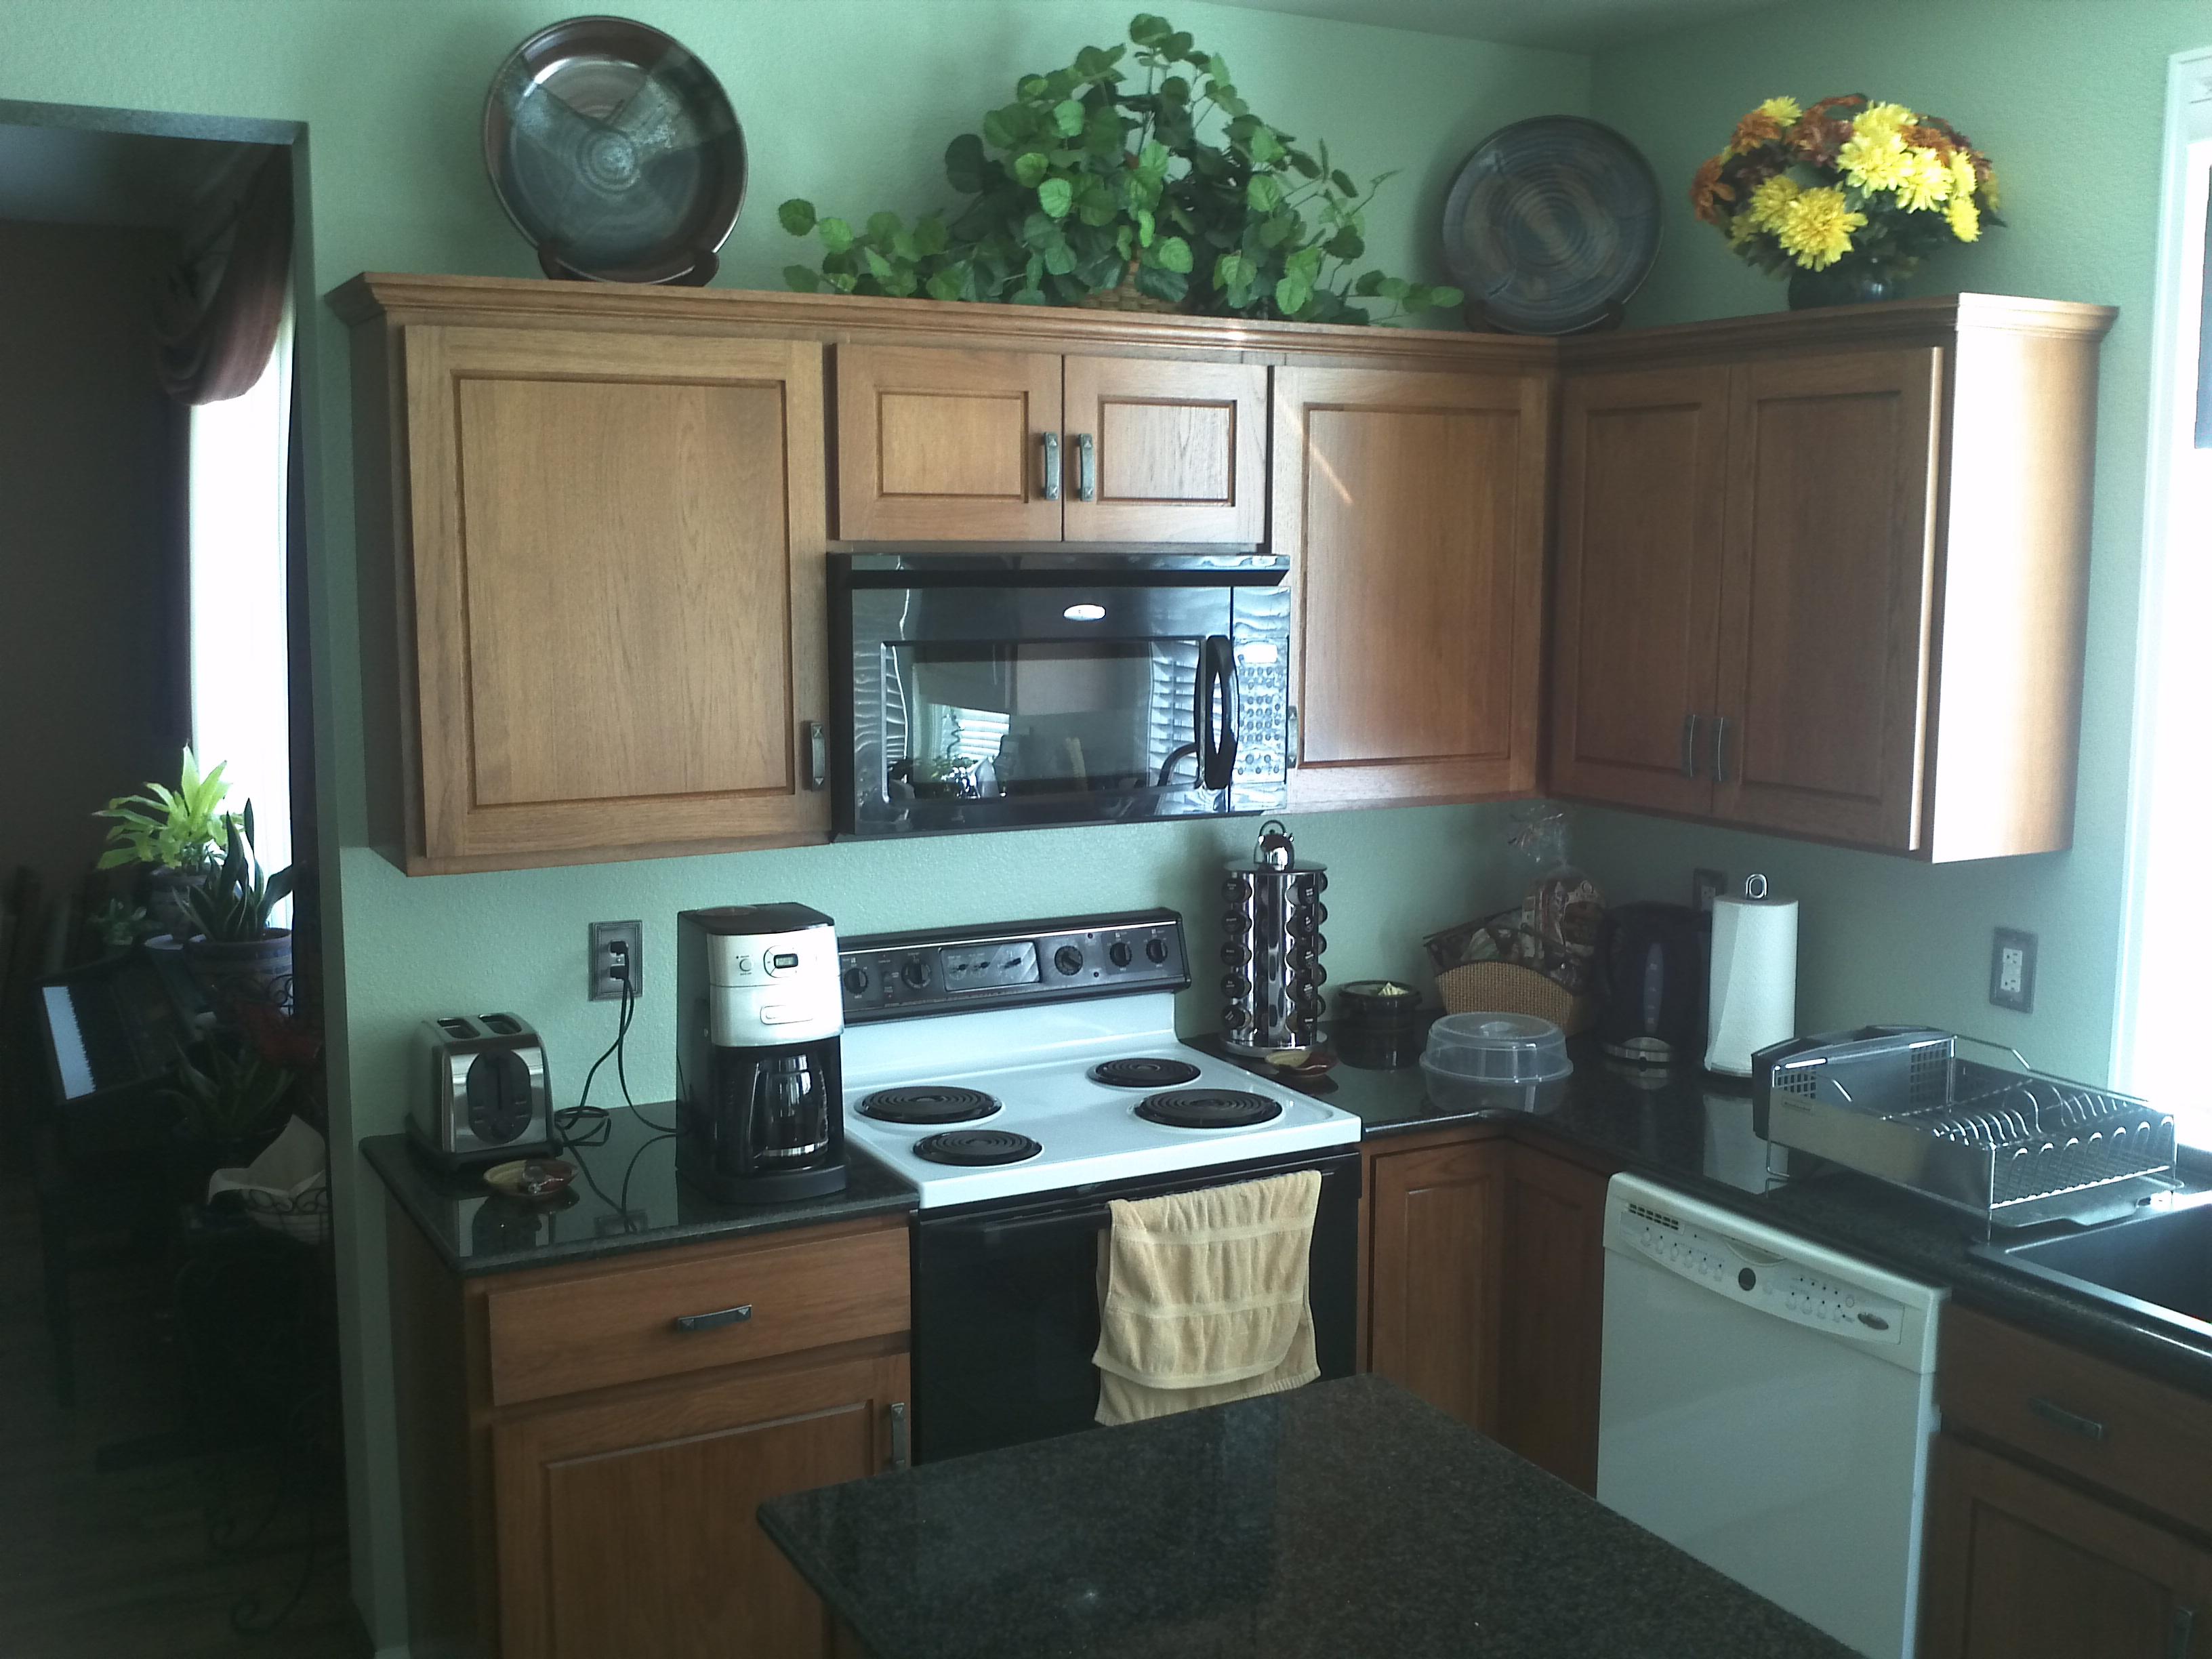 Signature Home Improvements of Idaho – NEW Refacing Options!